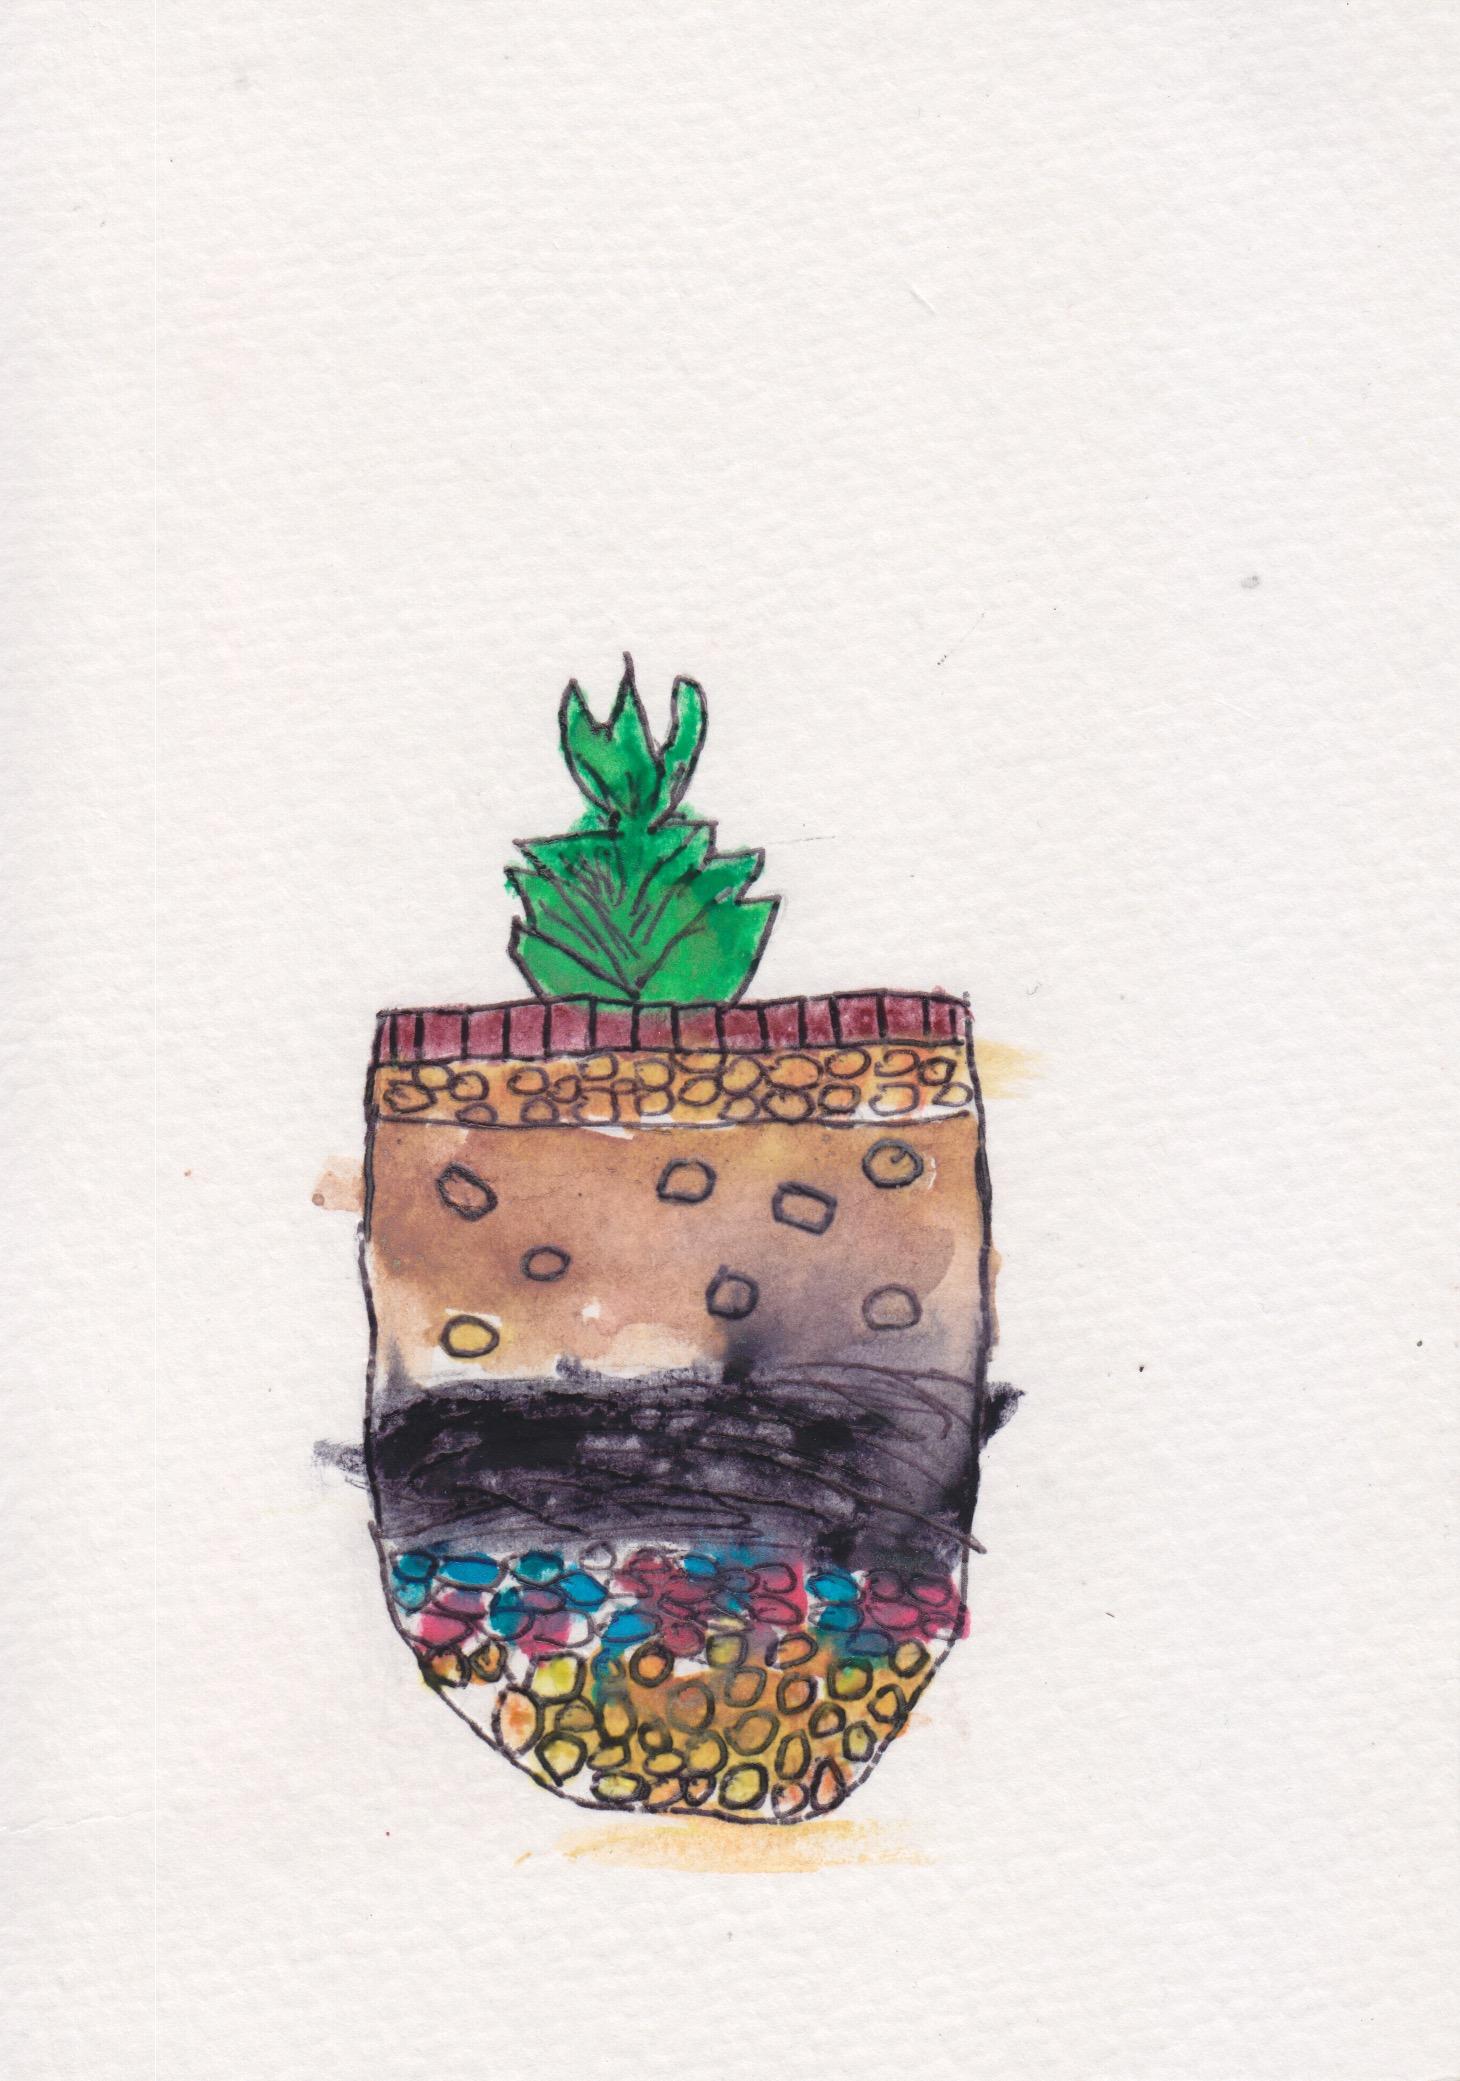 centro_watercolor terrarium_TanishaCruz.jpeg